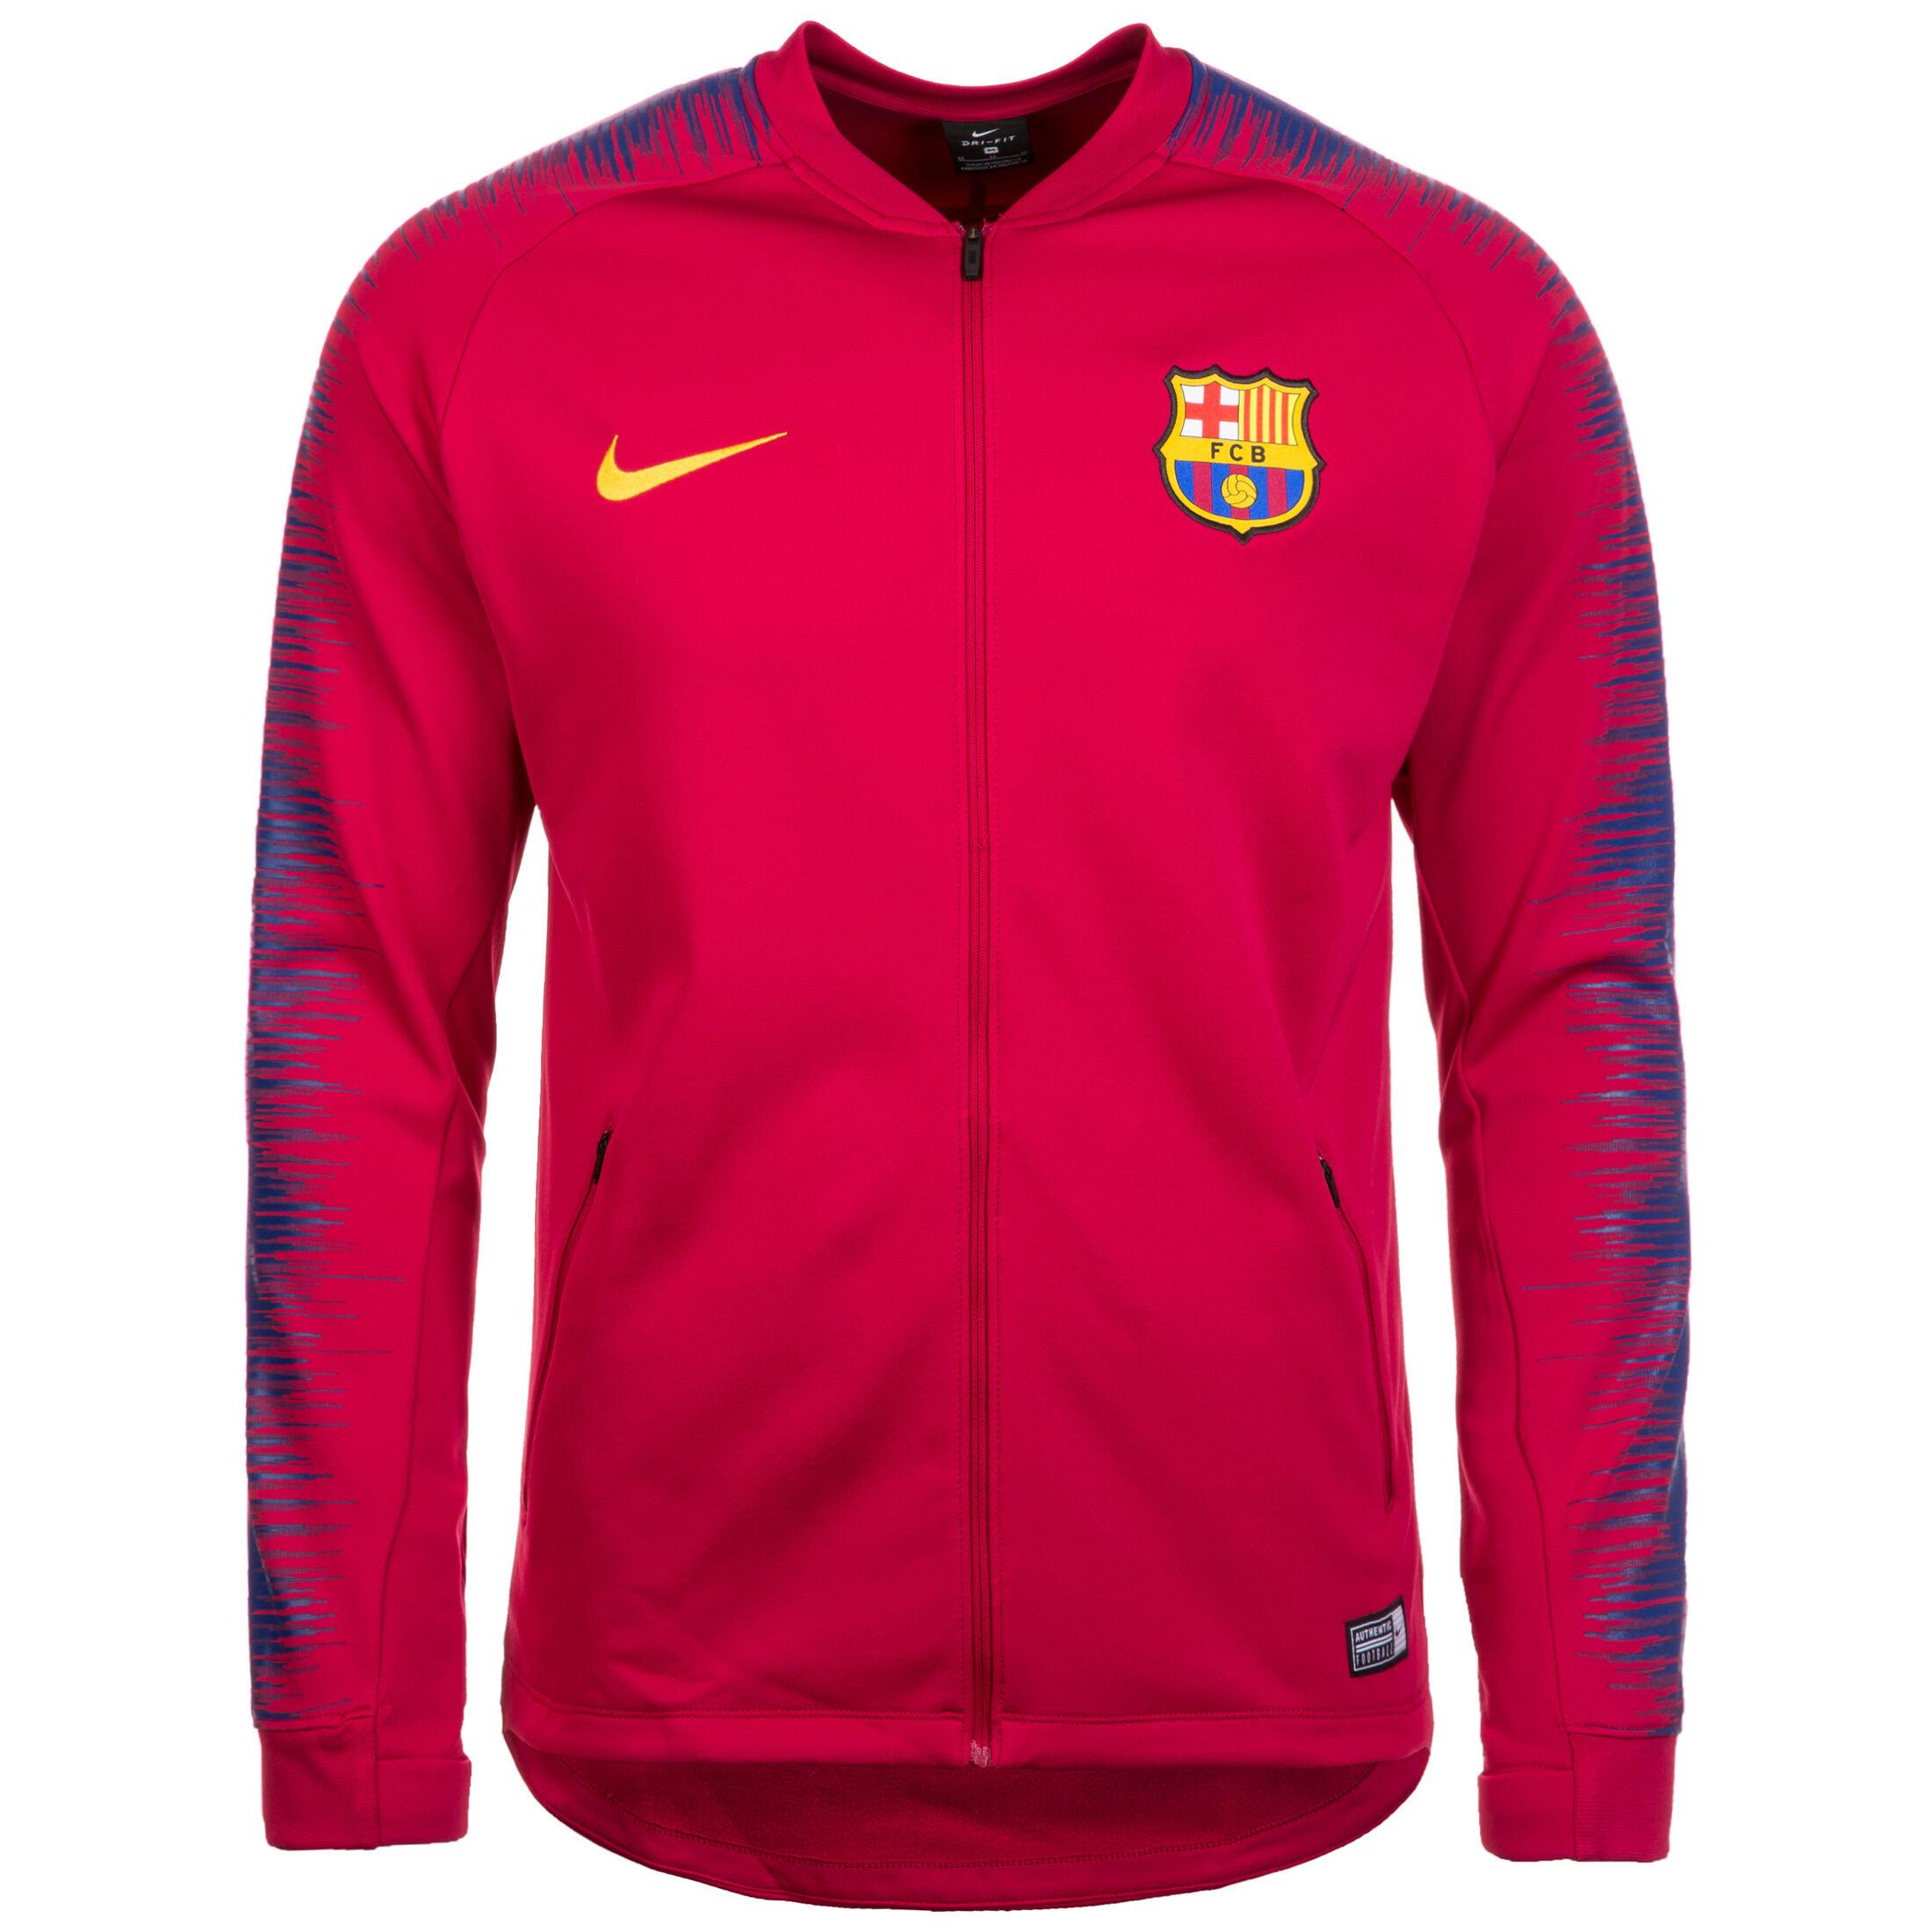 05a2a7604 Barcelona Bei Performance Outfitter Fc Nike Anthem Jacke Herren 4Yxxwfq